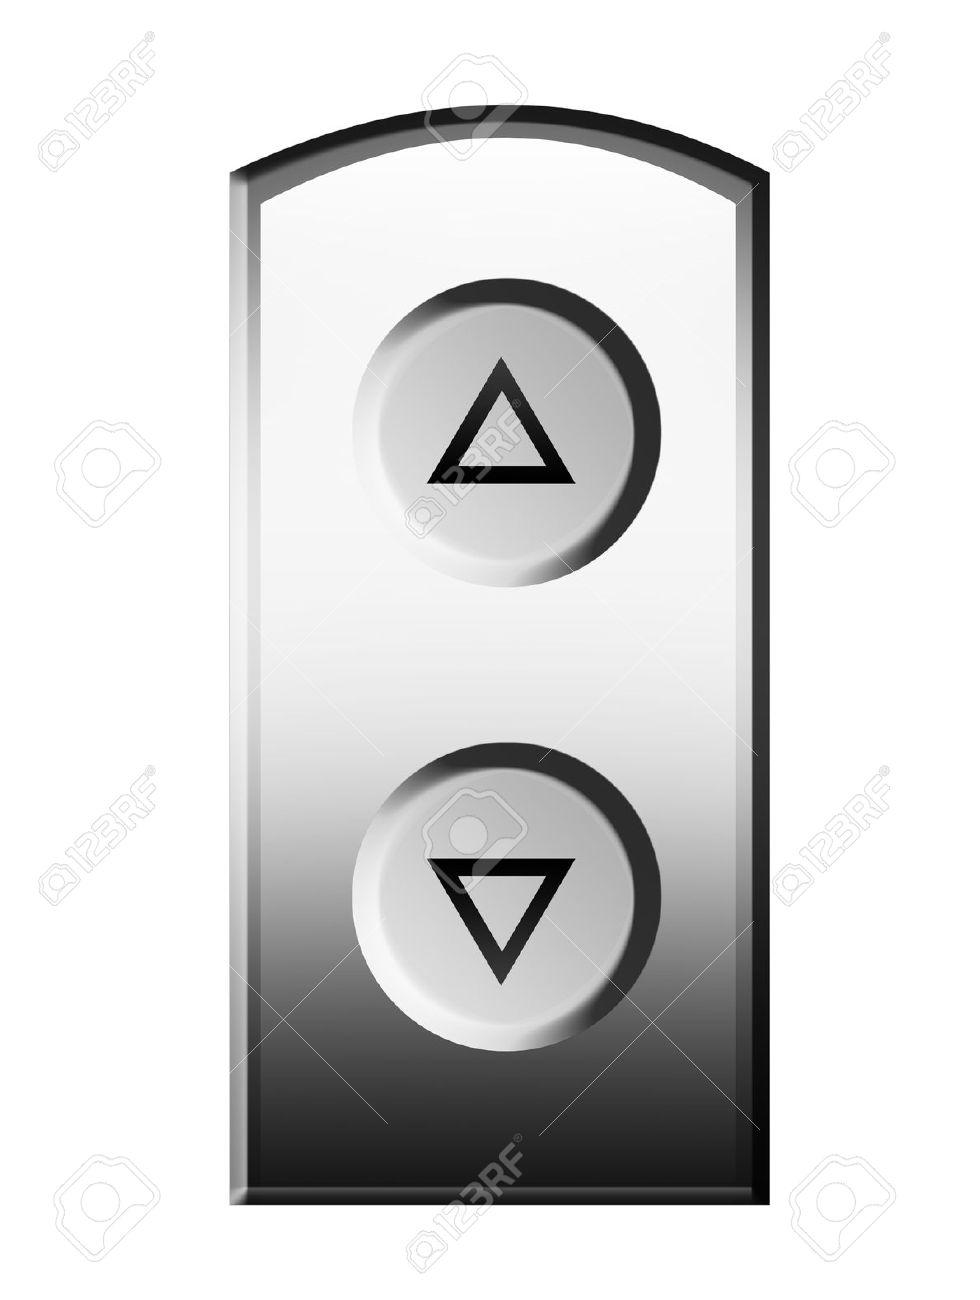 980x1300 Buttons Clipart